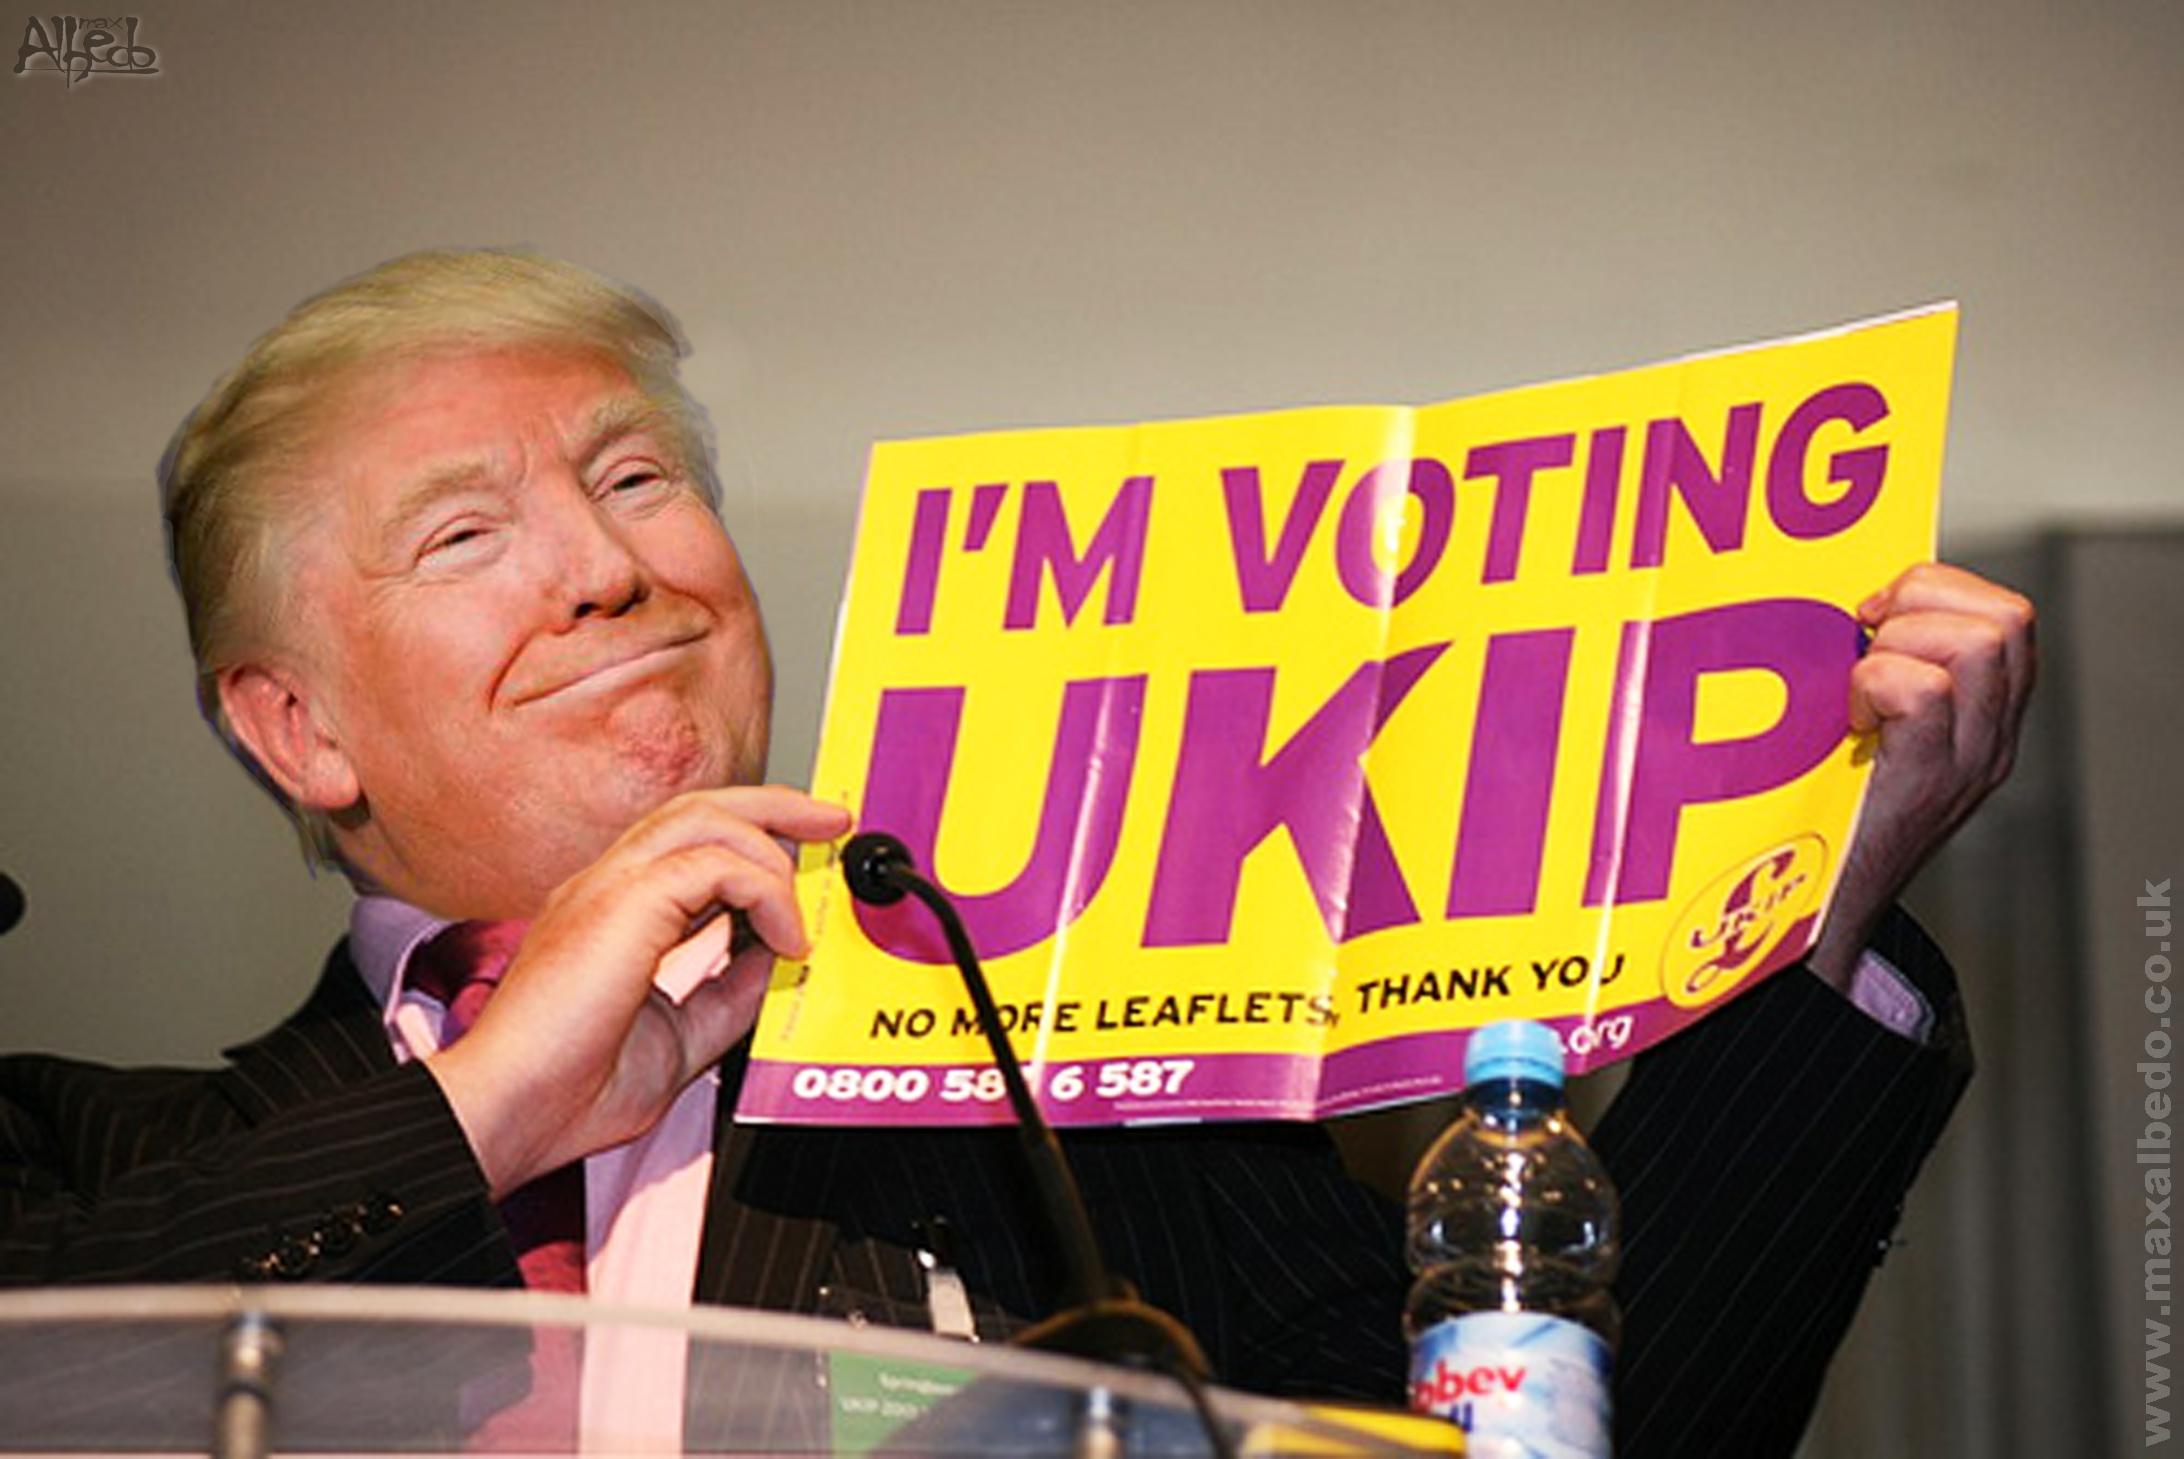 Donald Trump would vote UKIP